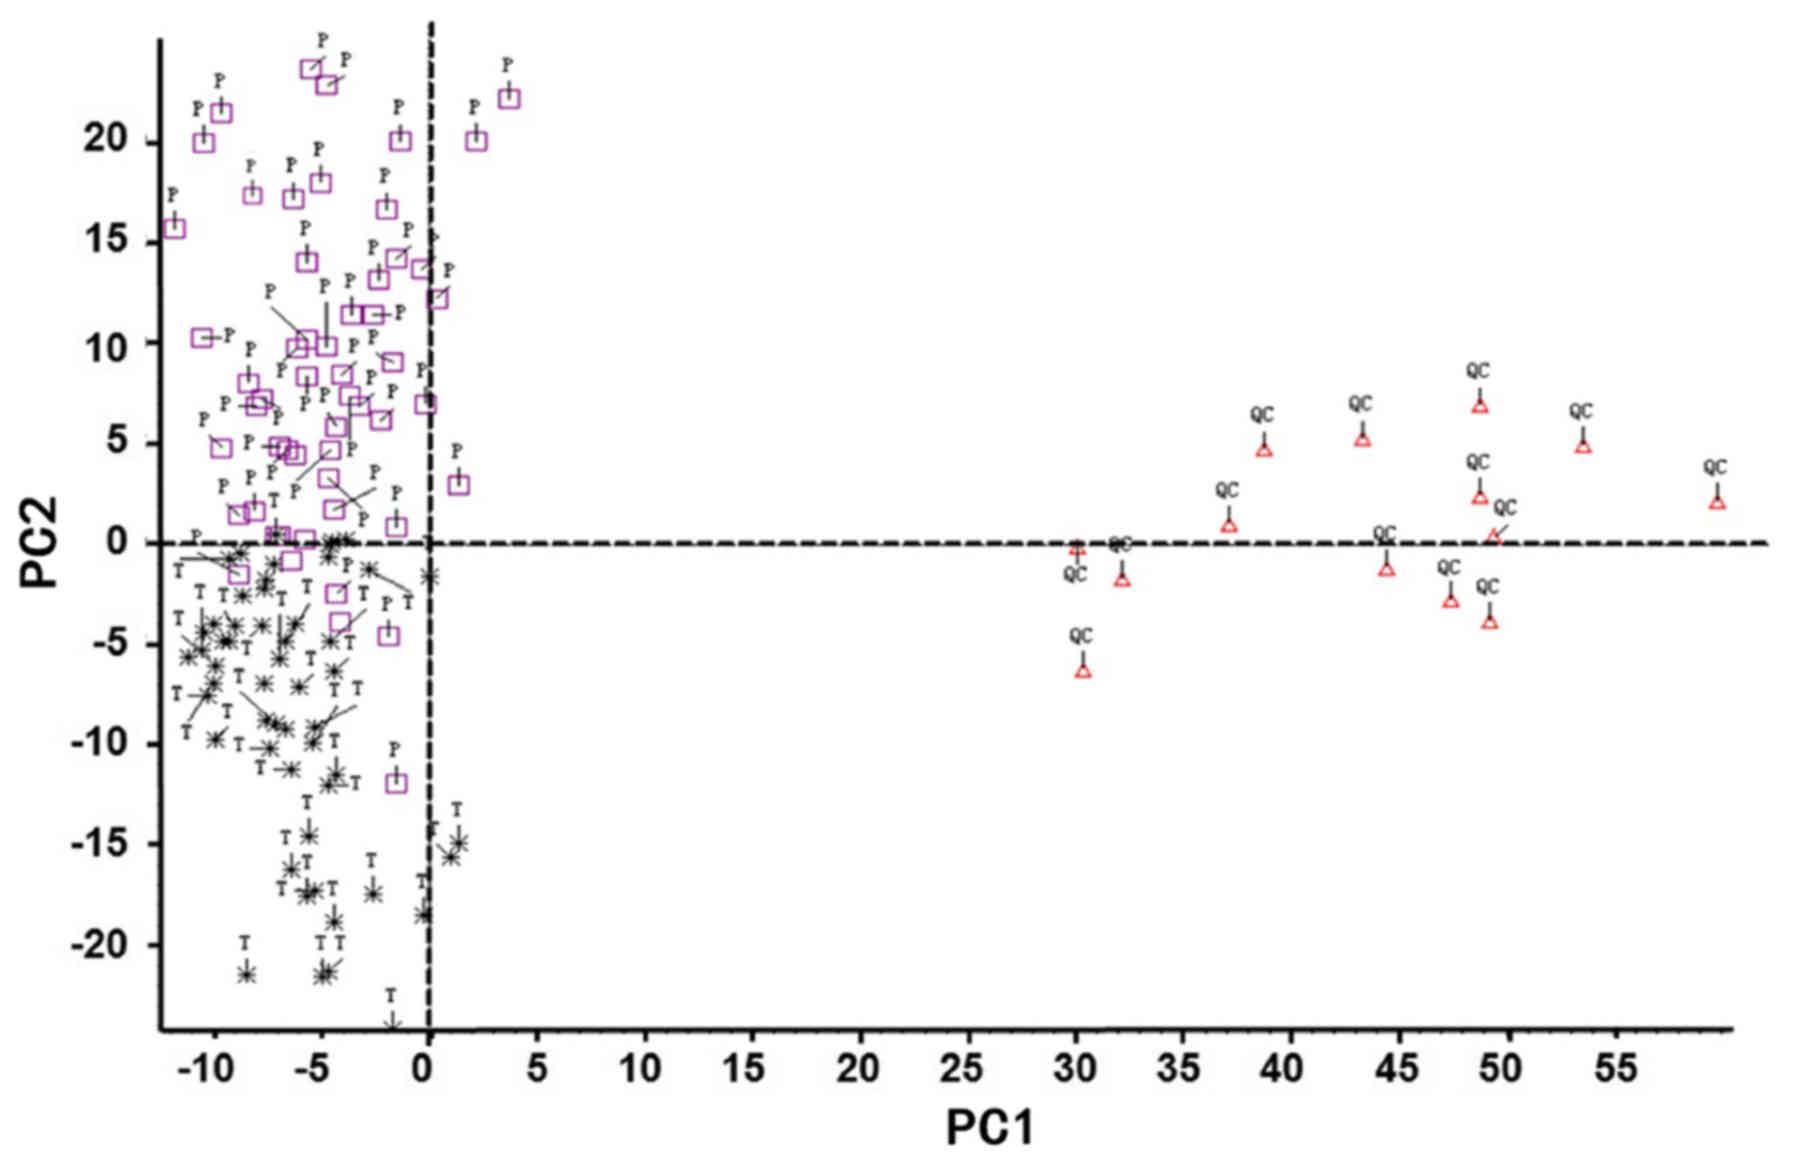 Profiling Of Serum Metabolites In Advanced Colon Cancer Using Liquid Chromatography Mass Spectrometry